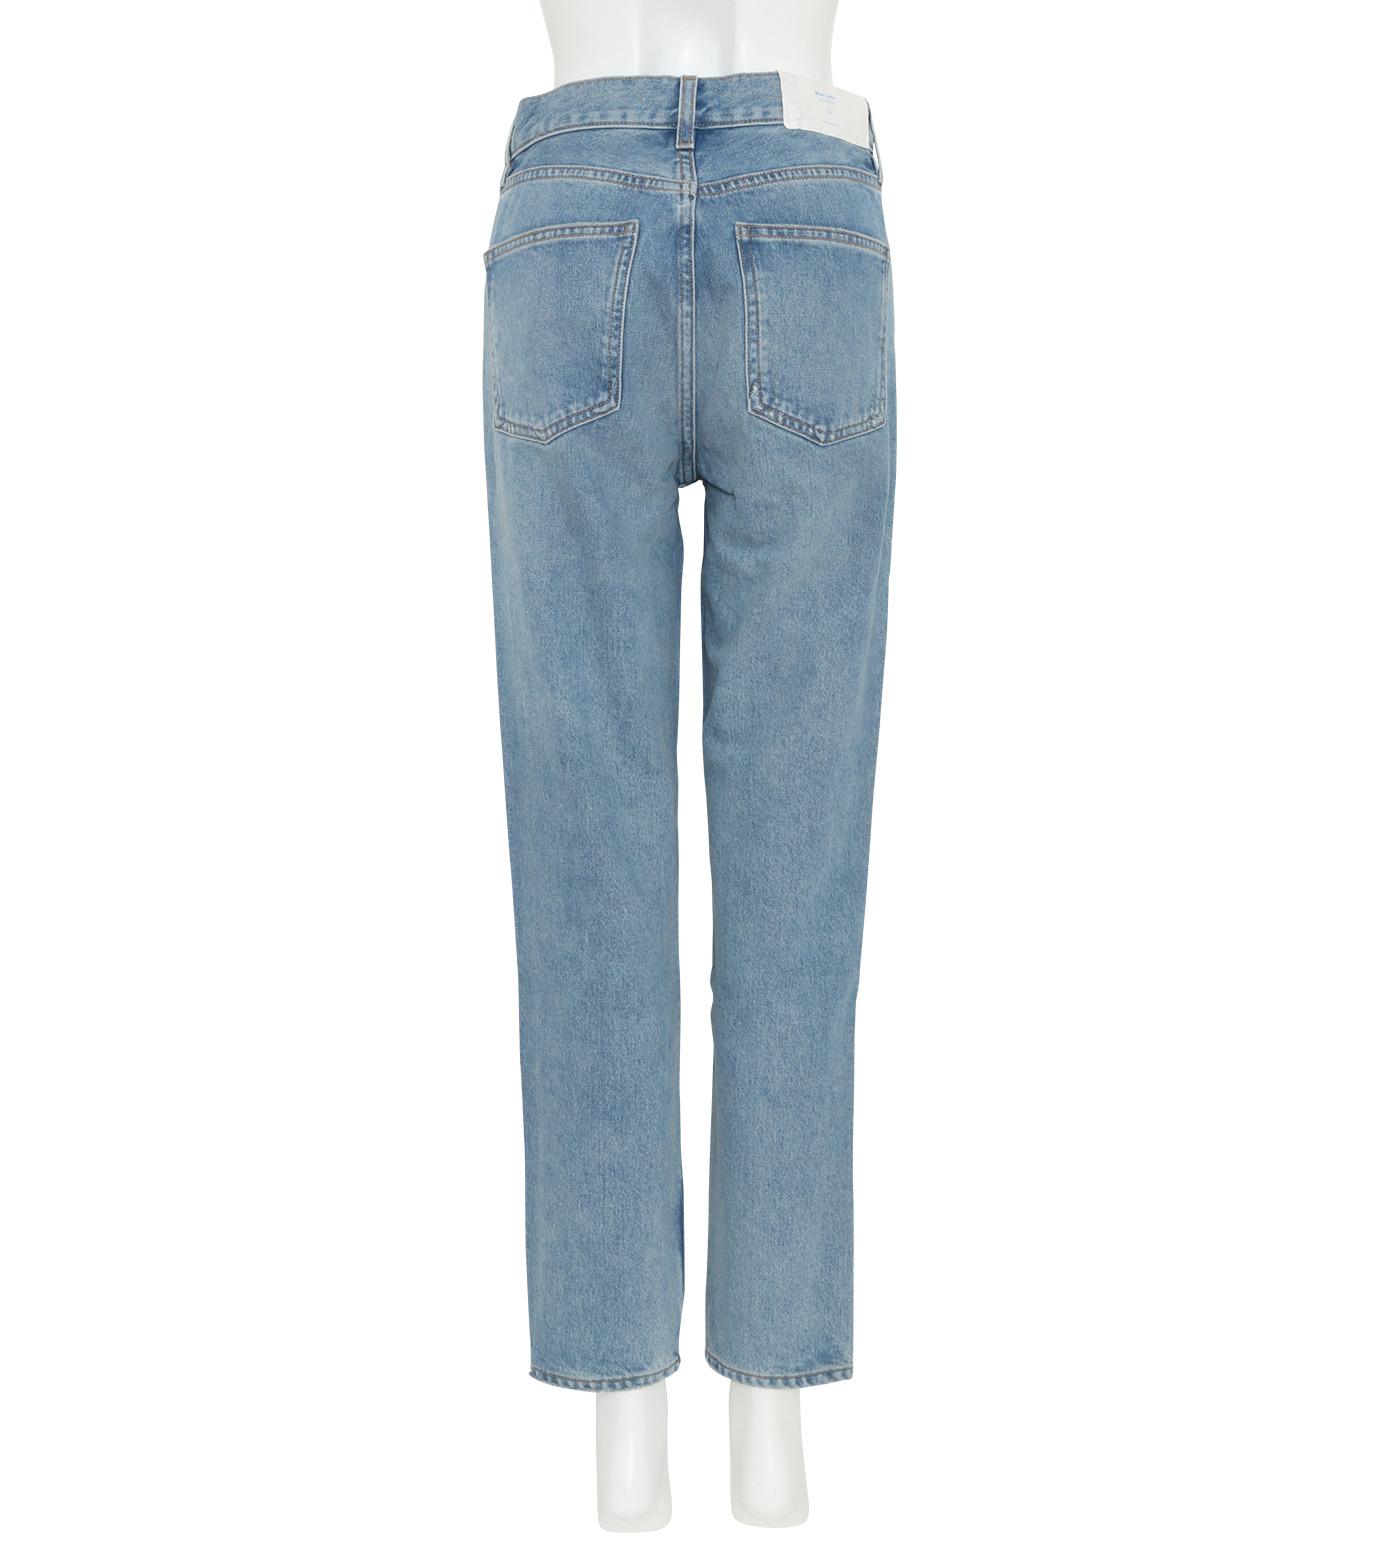 M.i.h Jeans(エムアイエイチジーンズ)のMimi Boyfriend-LIGHT BLUE(デニム/denim)-W2200101-91 拡大詳細画像2